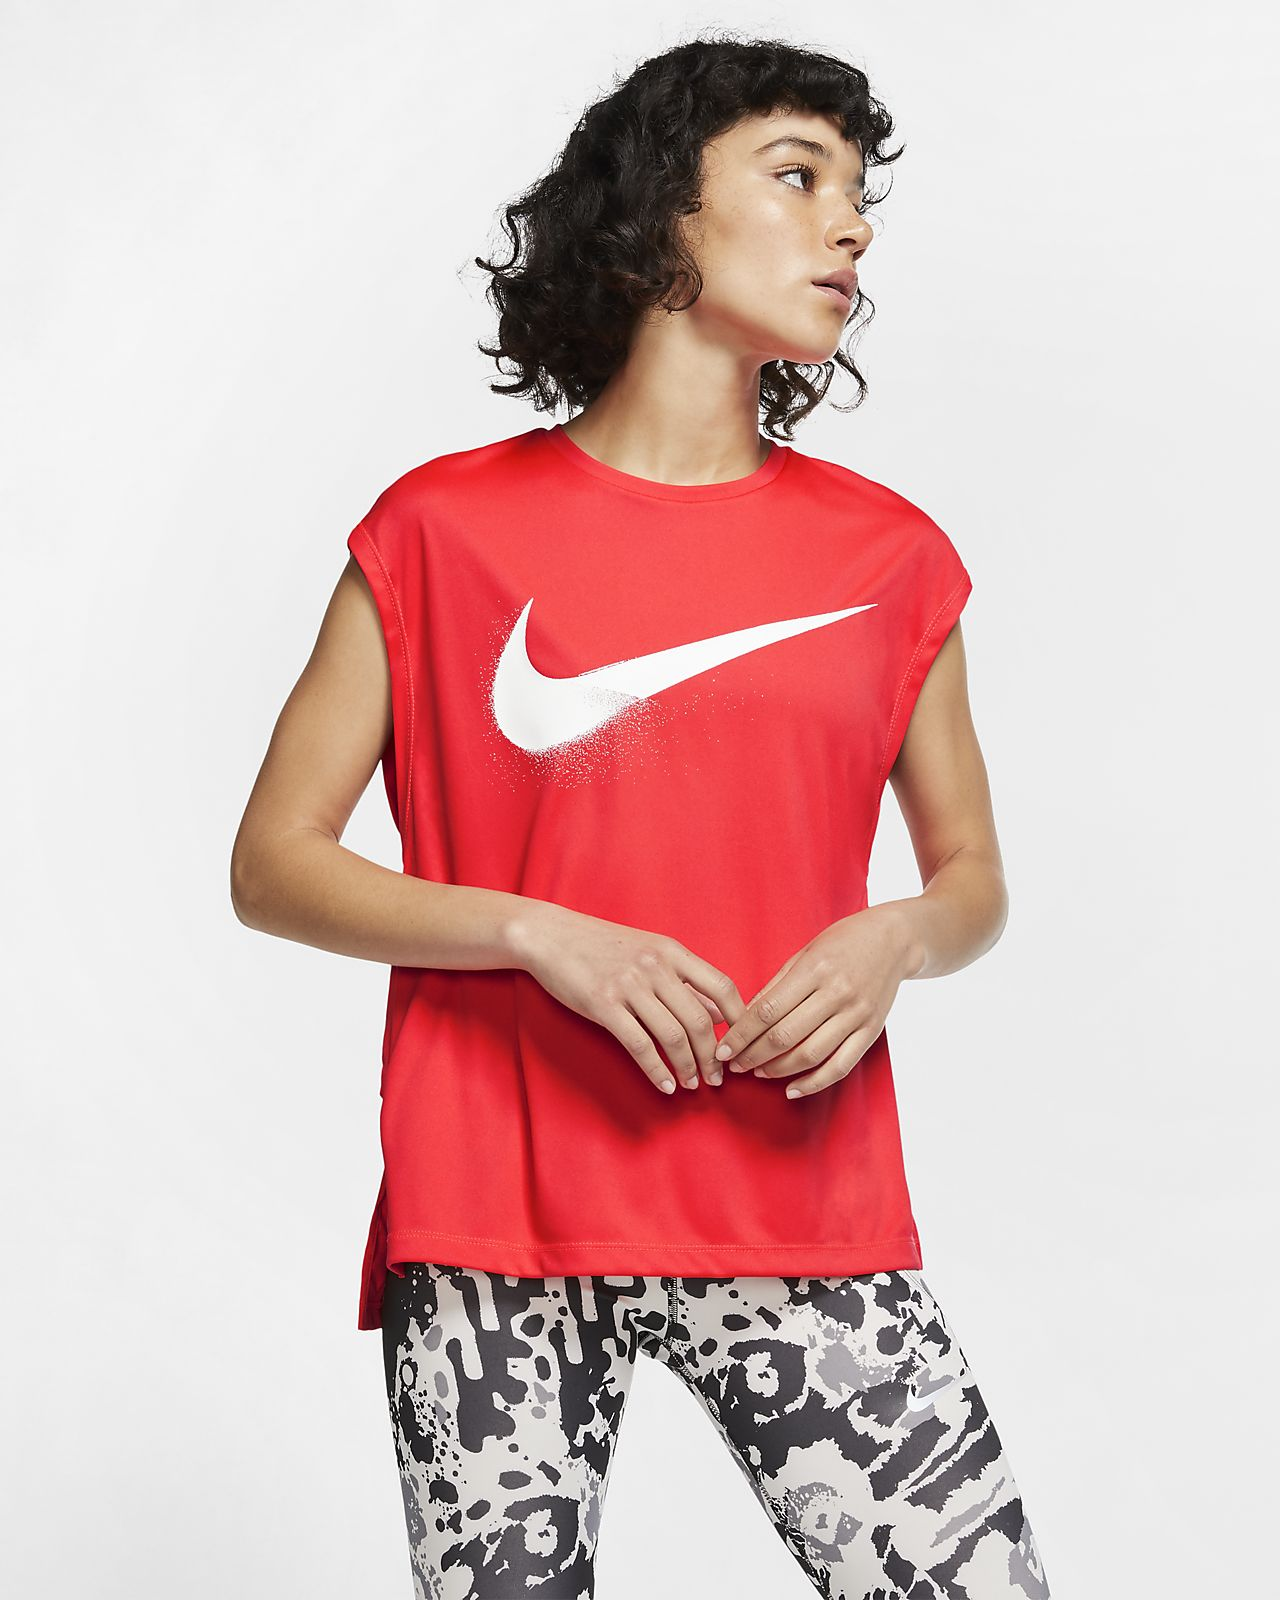 Nike Dri-FIT Camiseta de running con estampado - Mujer